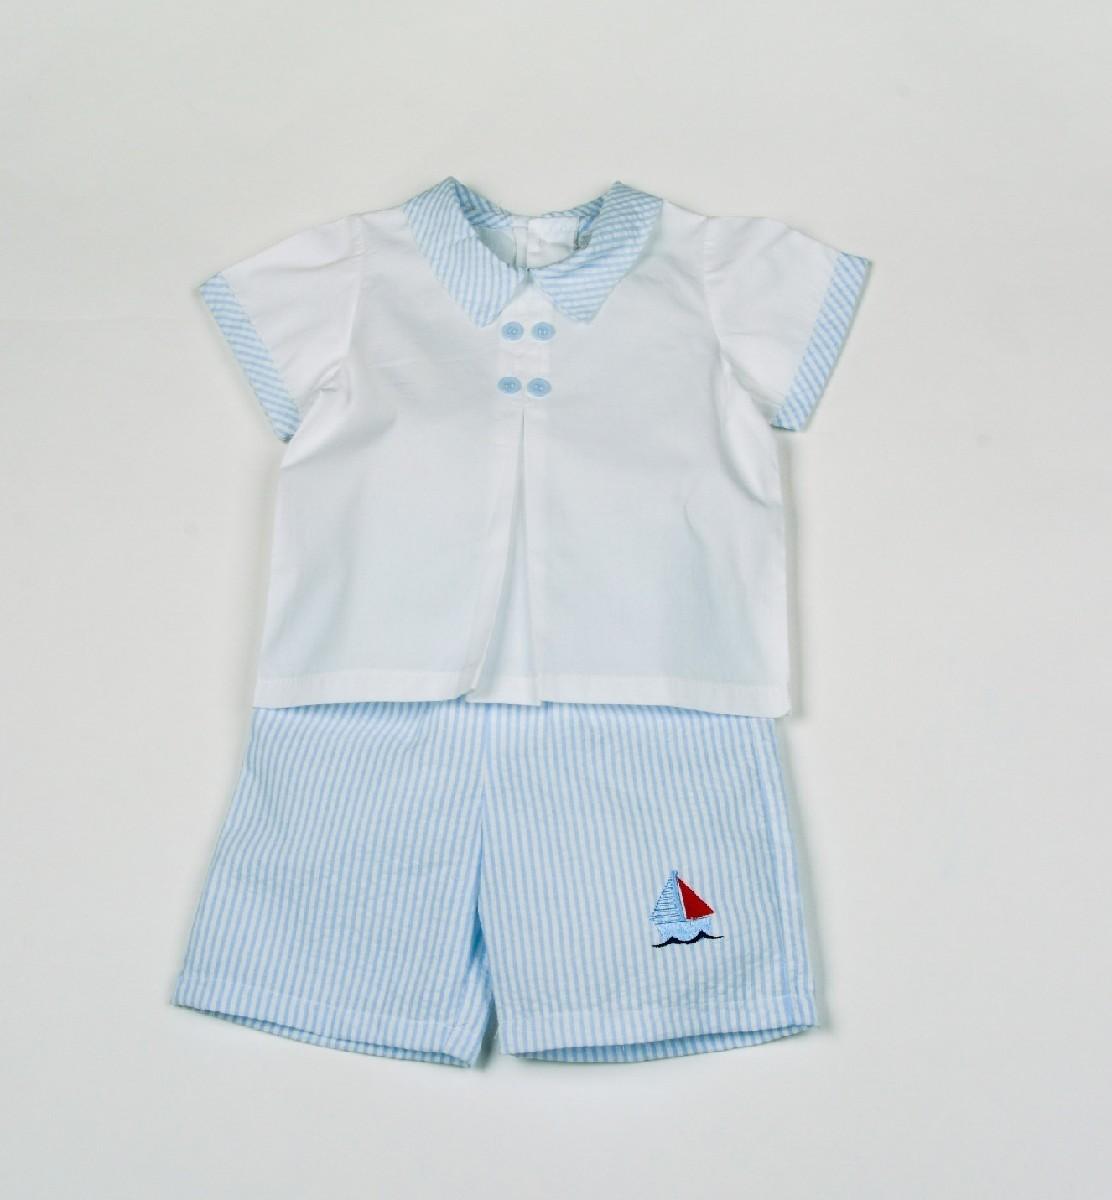 2pcs Shorts +T-shirt, Boat